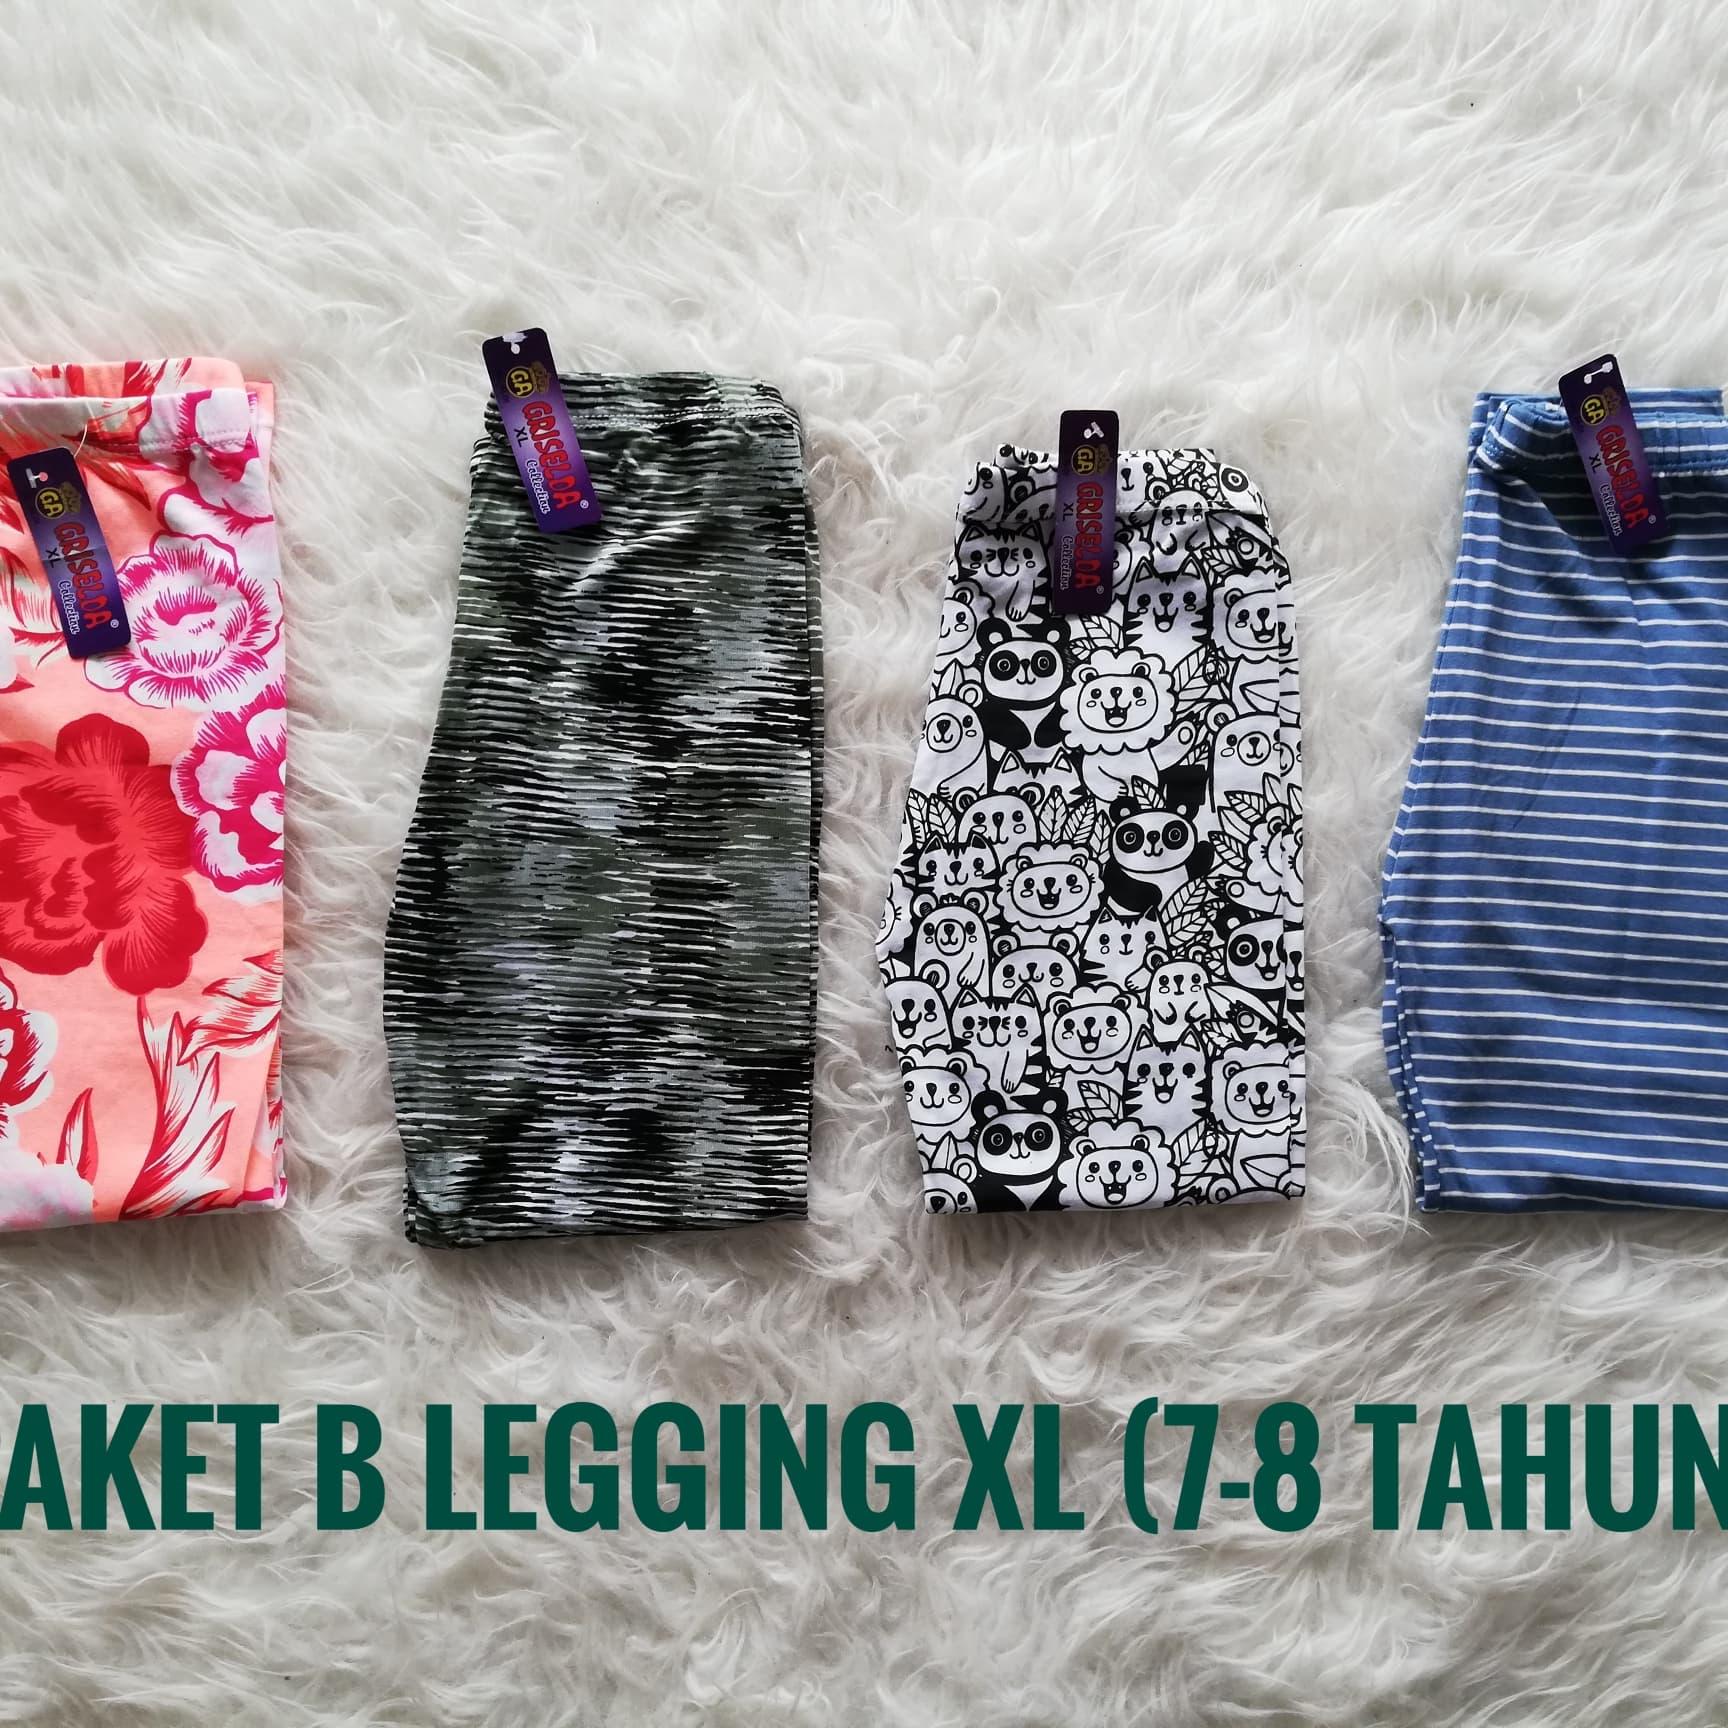 PENAWARAN Paket B Celana Legging Anak 7-8 Tahun f5b8a32d53